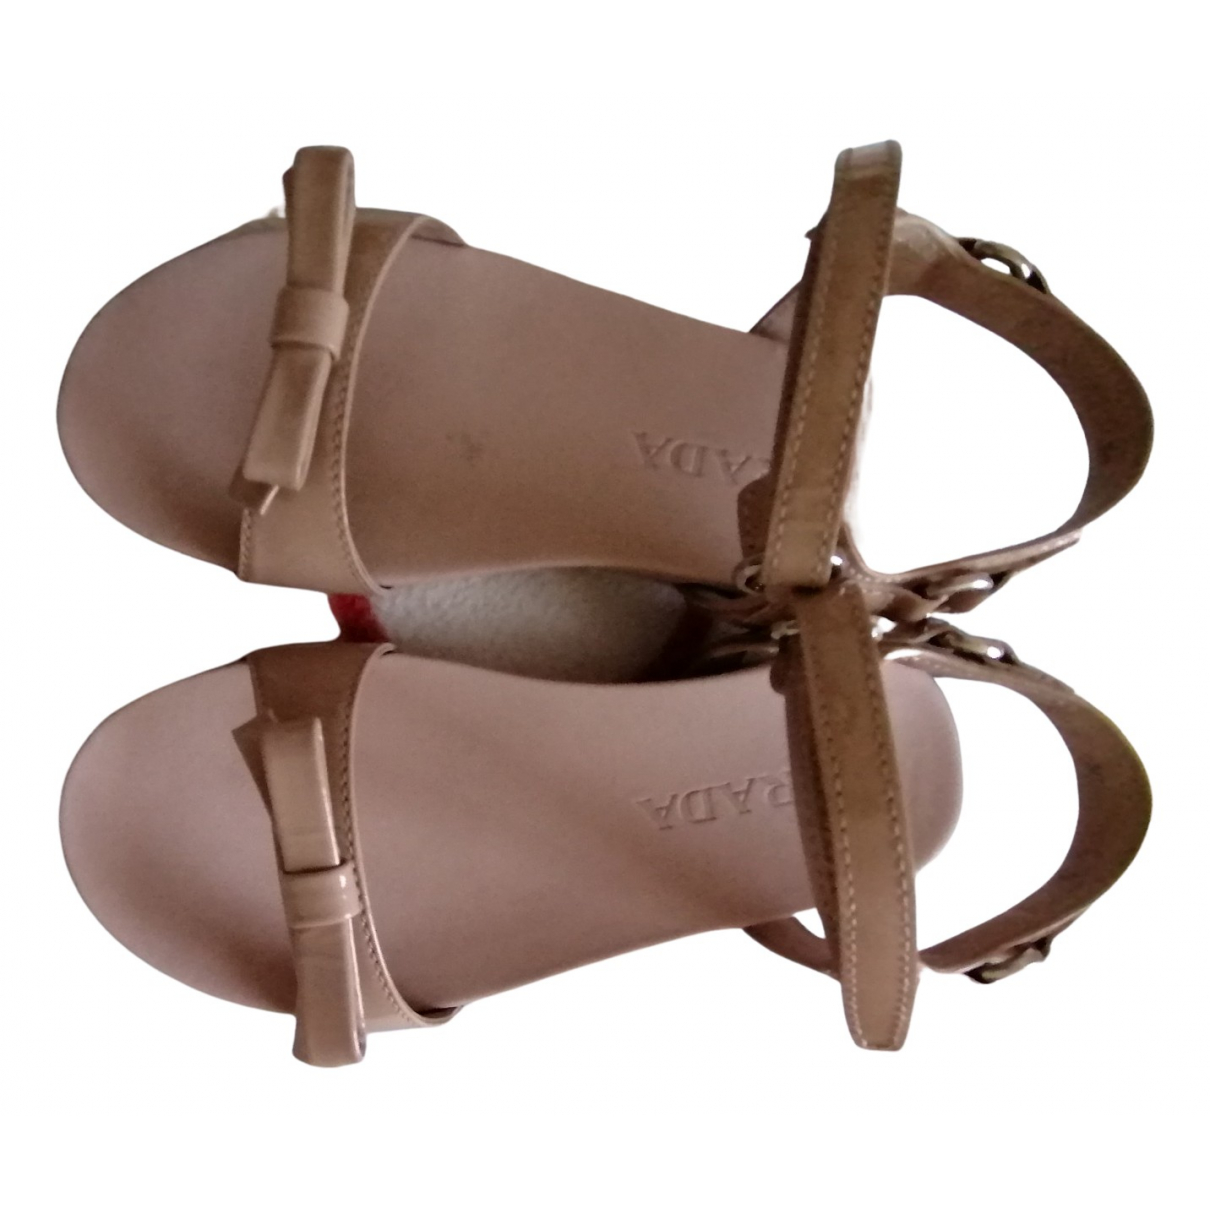 Prada N Pink Patent leather Sandals for Kids 30 FR